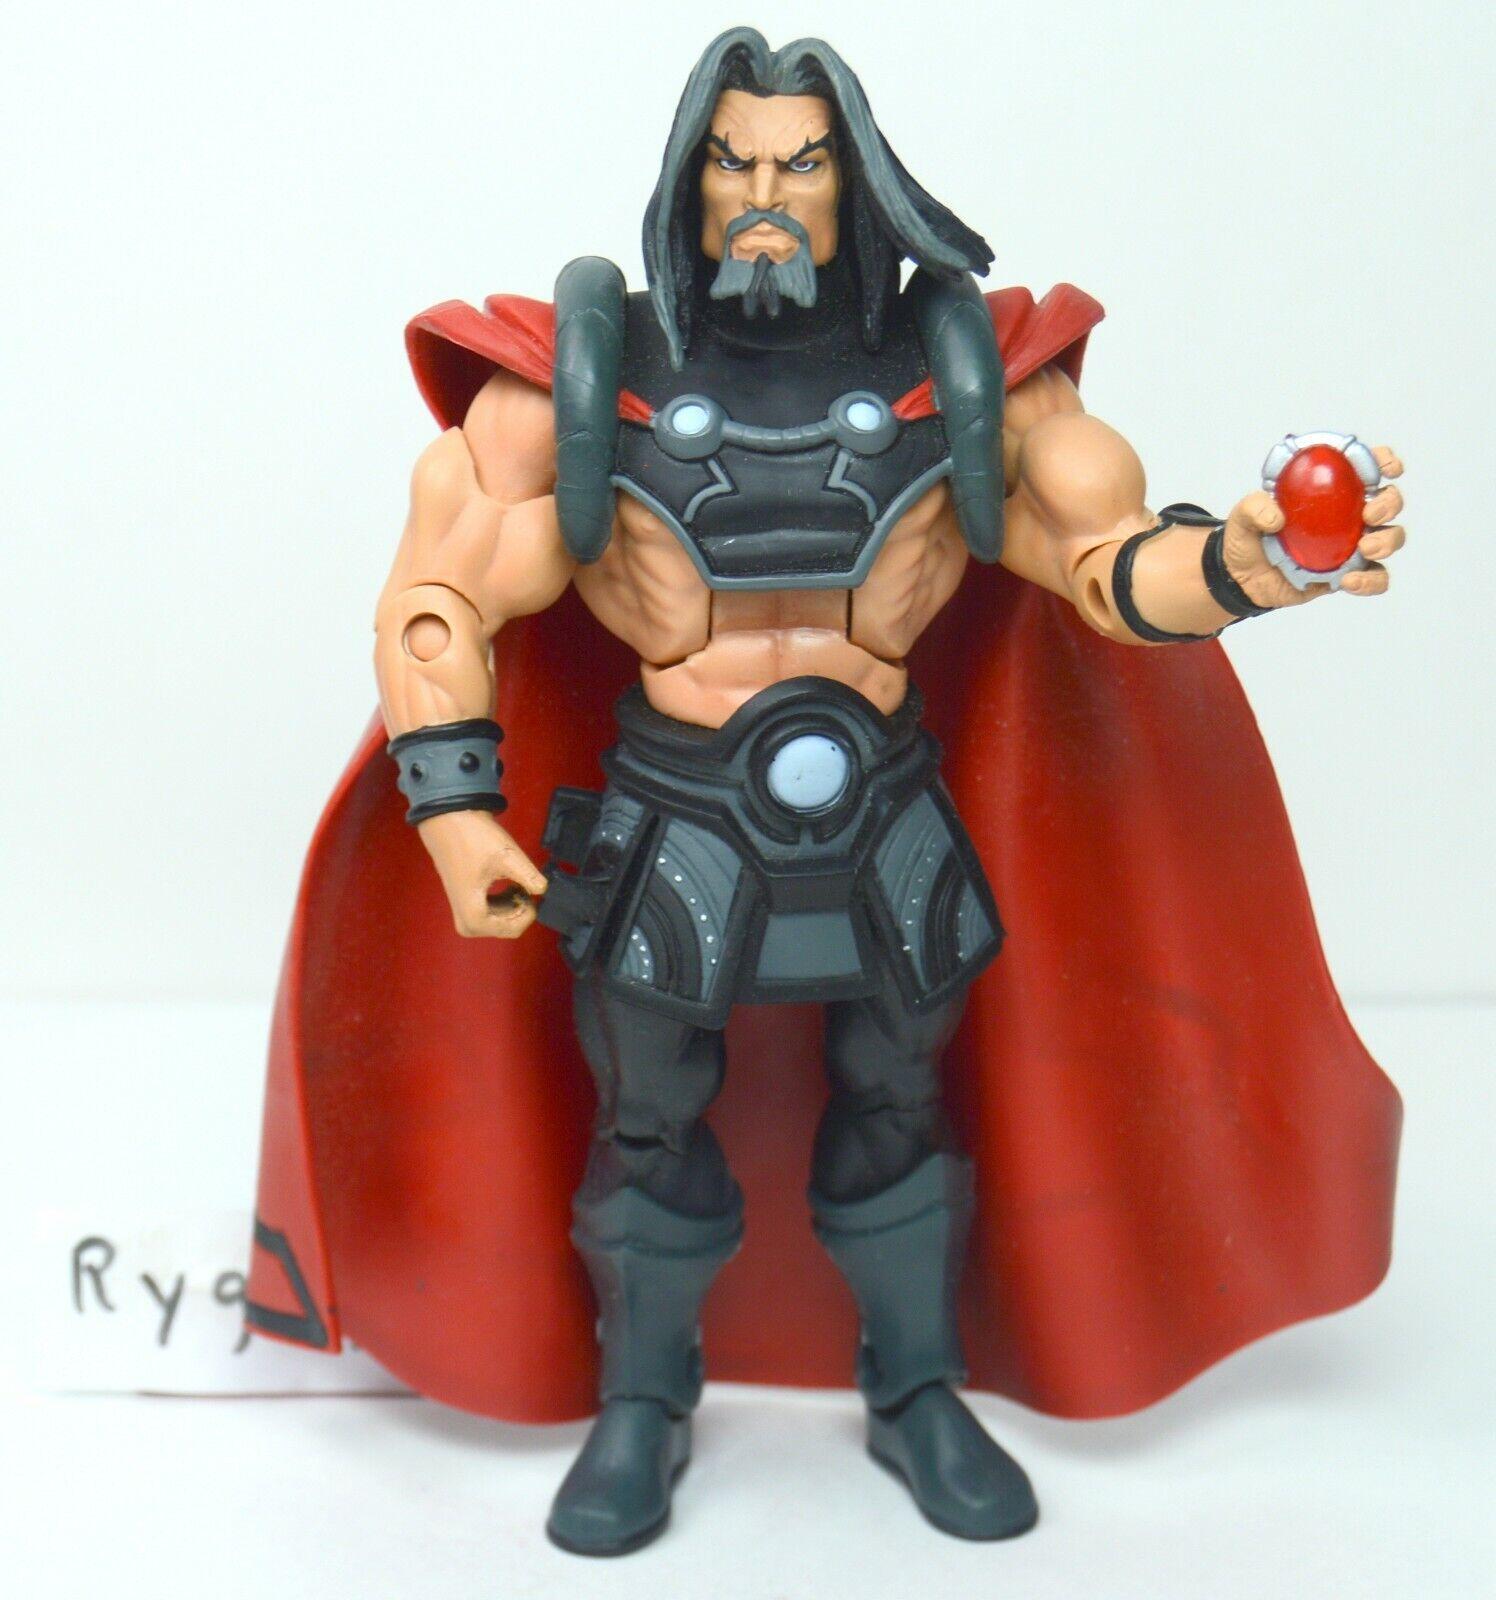 MOTUC, Count Marzo, figure, Masters of the Universe Classics, cape, He-Man